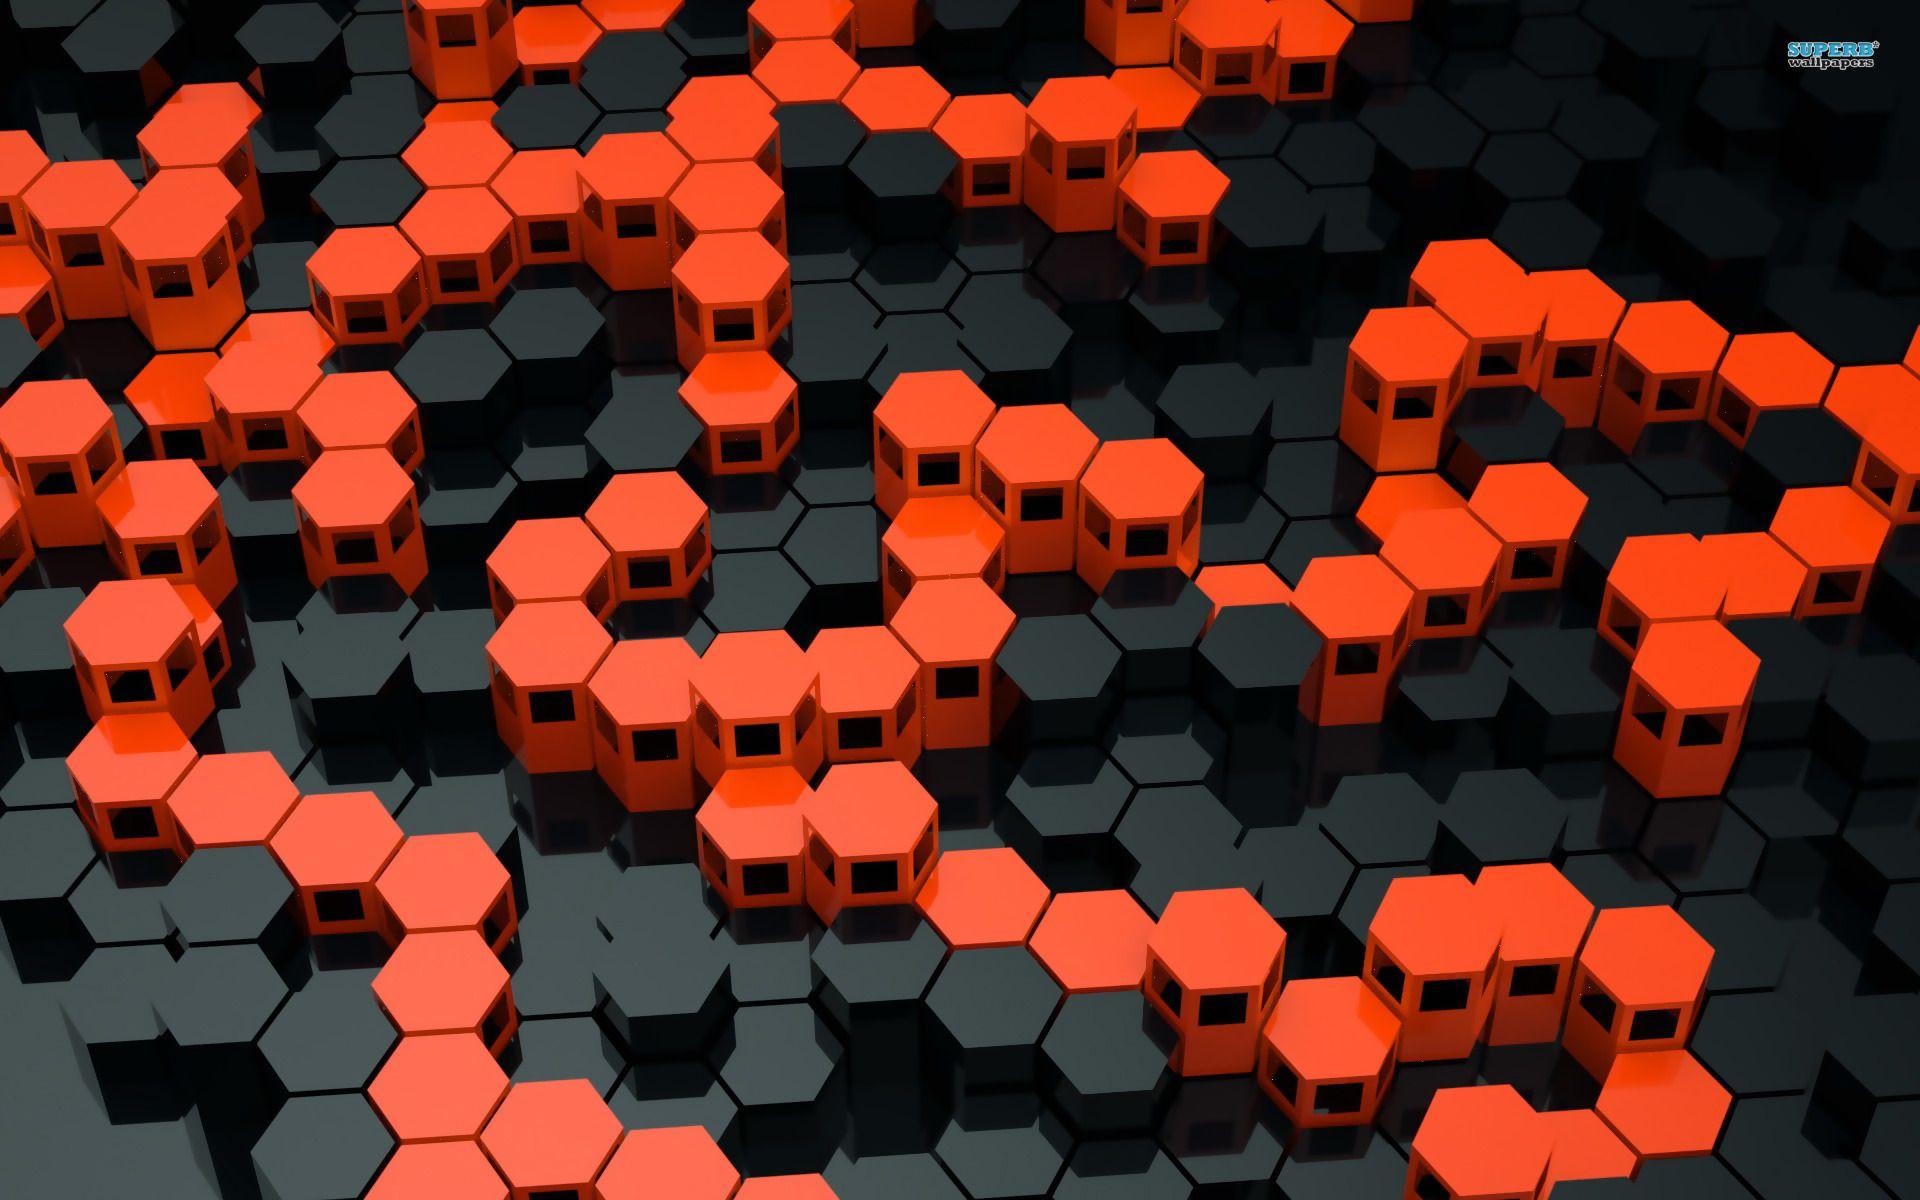 3d Hexagons Wallpaper 1920x1200 1200x1920px Hexagon Wallpapers Orange Tapete Papierwande